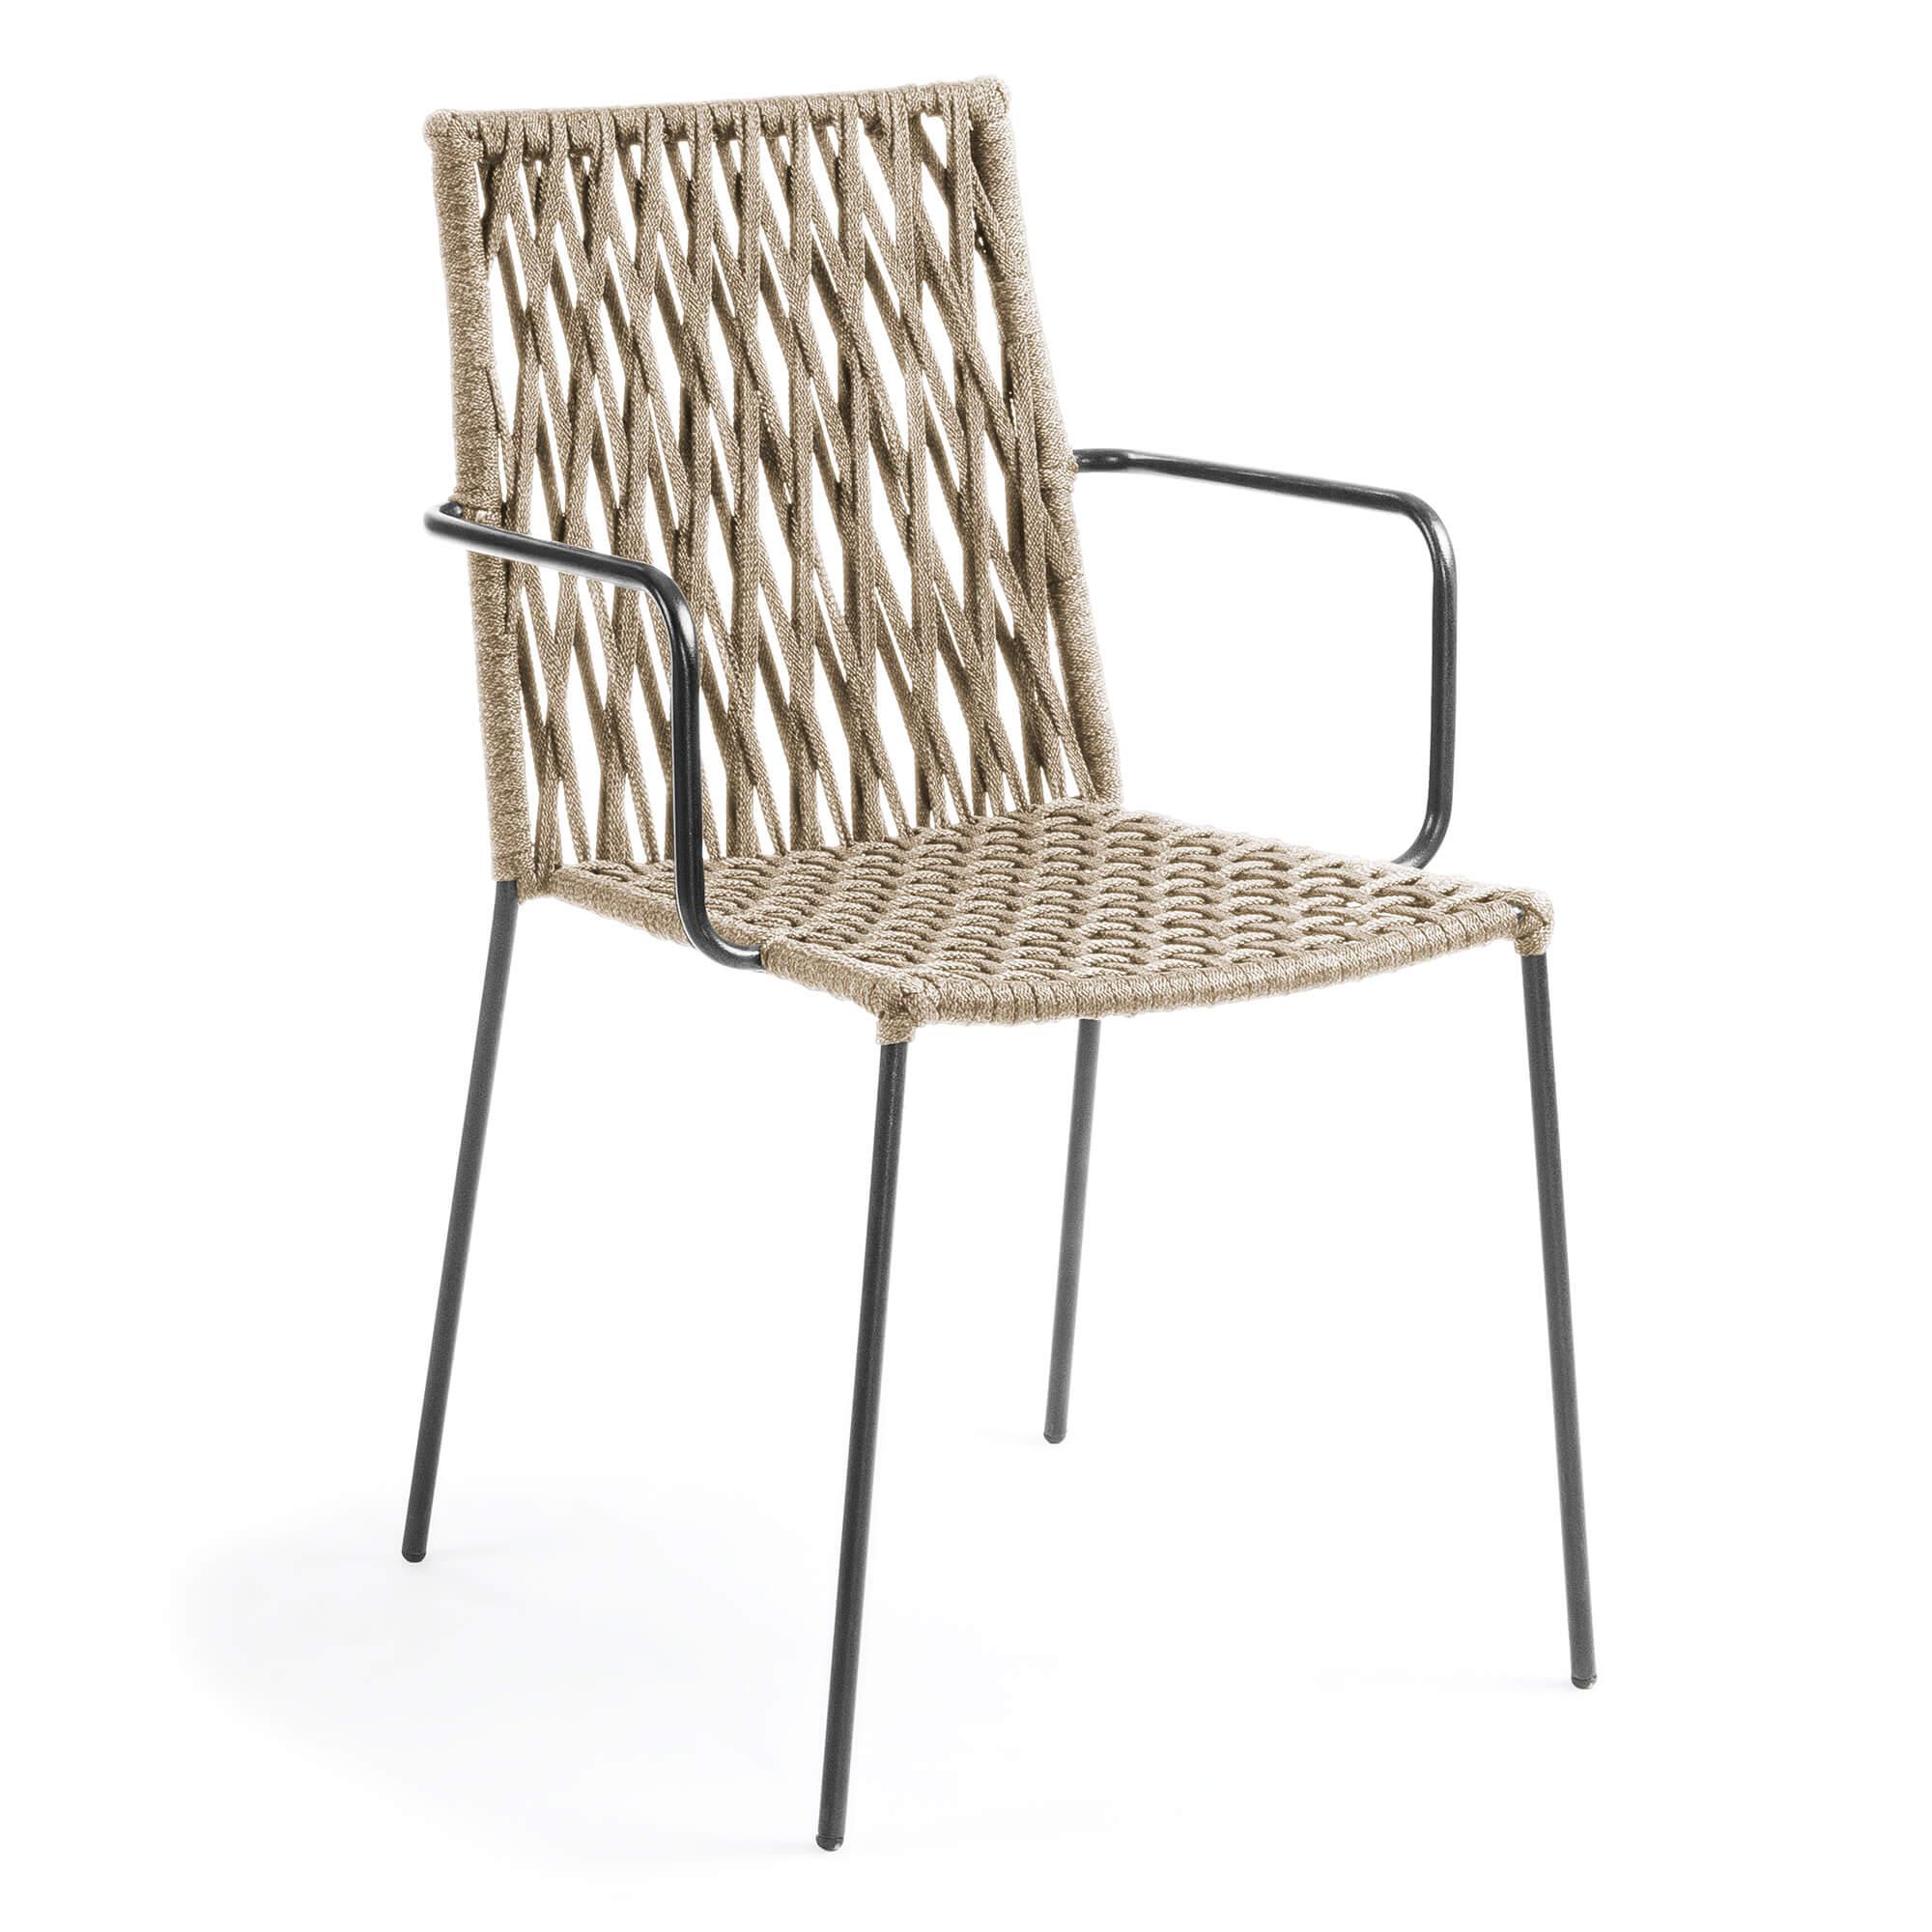 Laforma bettie lænestol - beige/grå polyester/stål, m. armlæn fra laforma på boboonline.dk